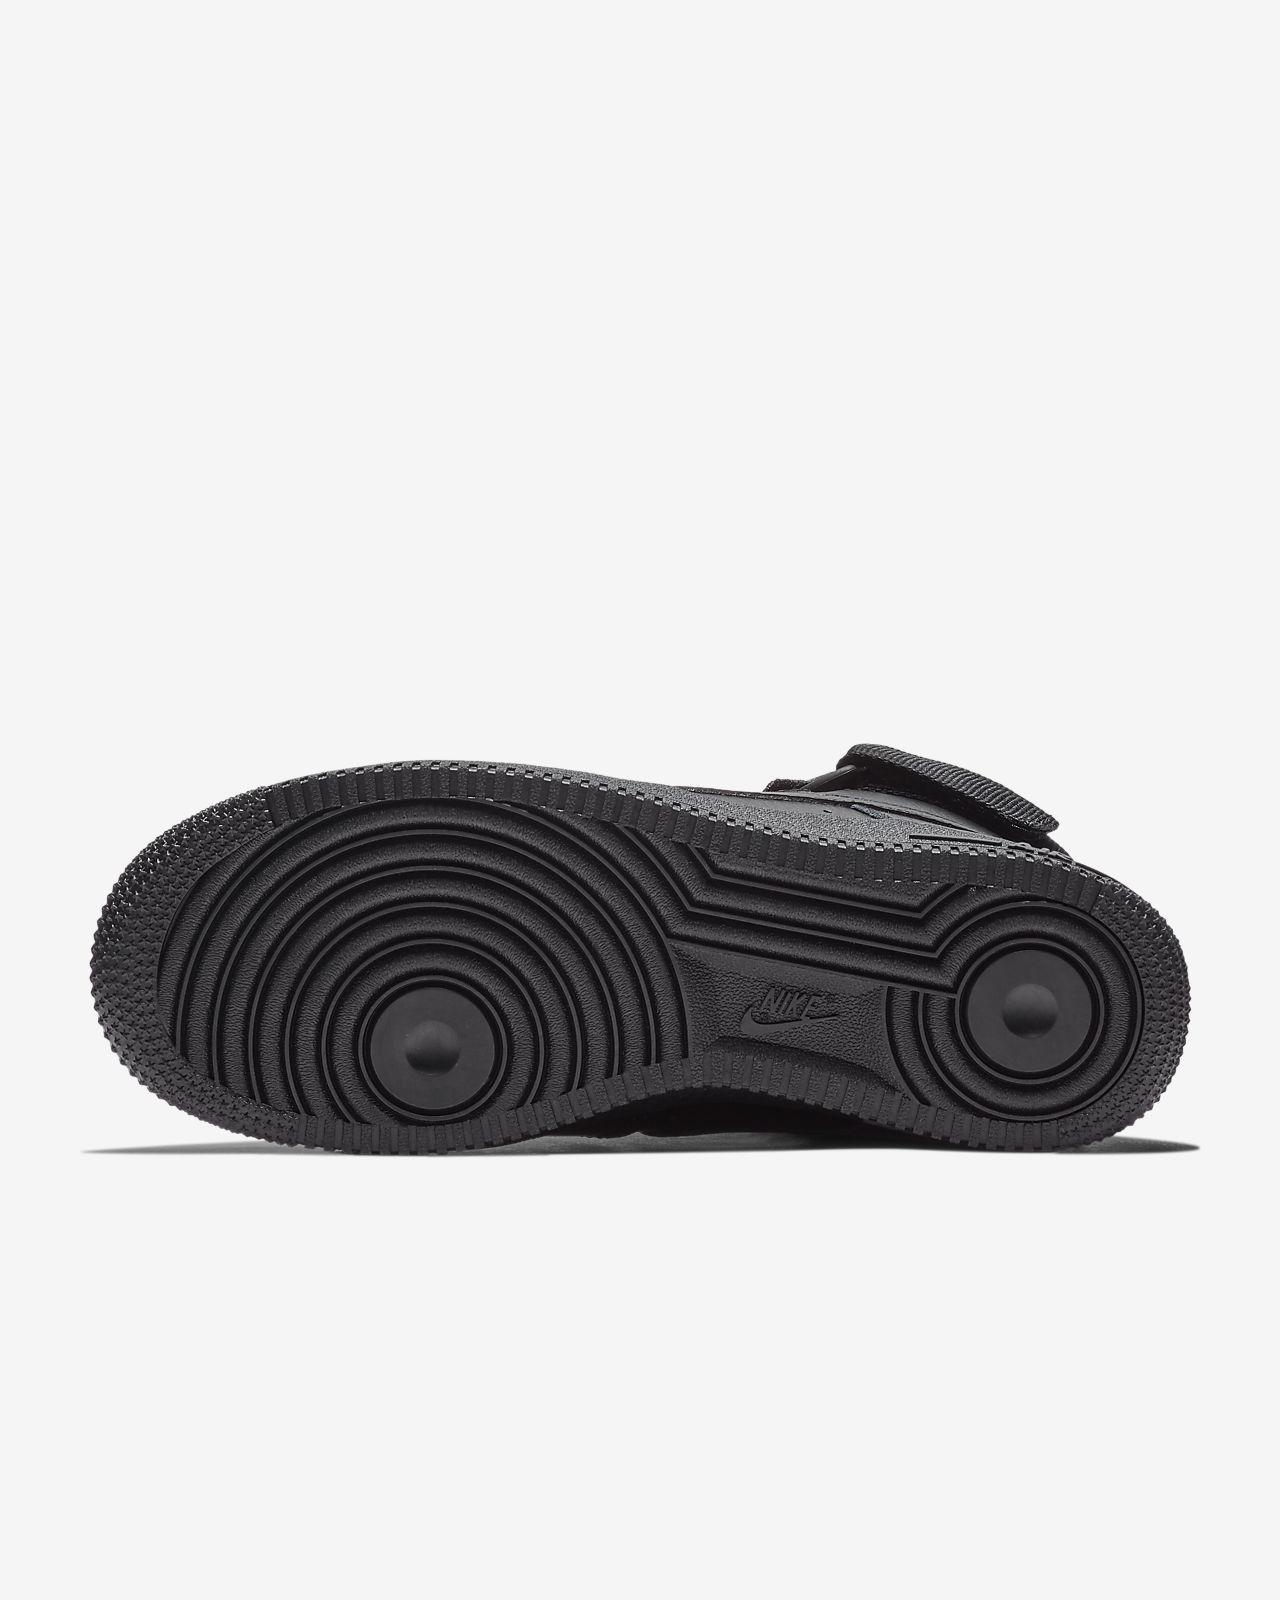 release info on 50e5e 51881 ... Nike Air Force 1 High Utility Women s Shoe